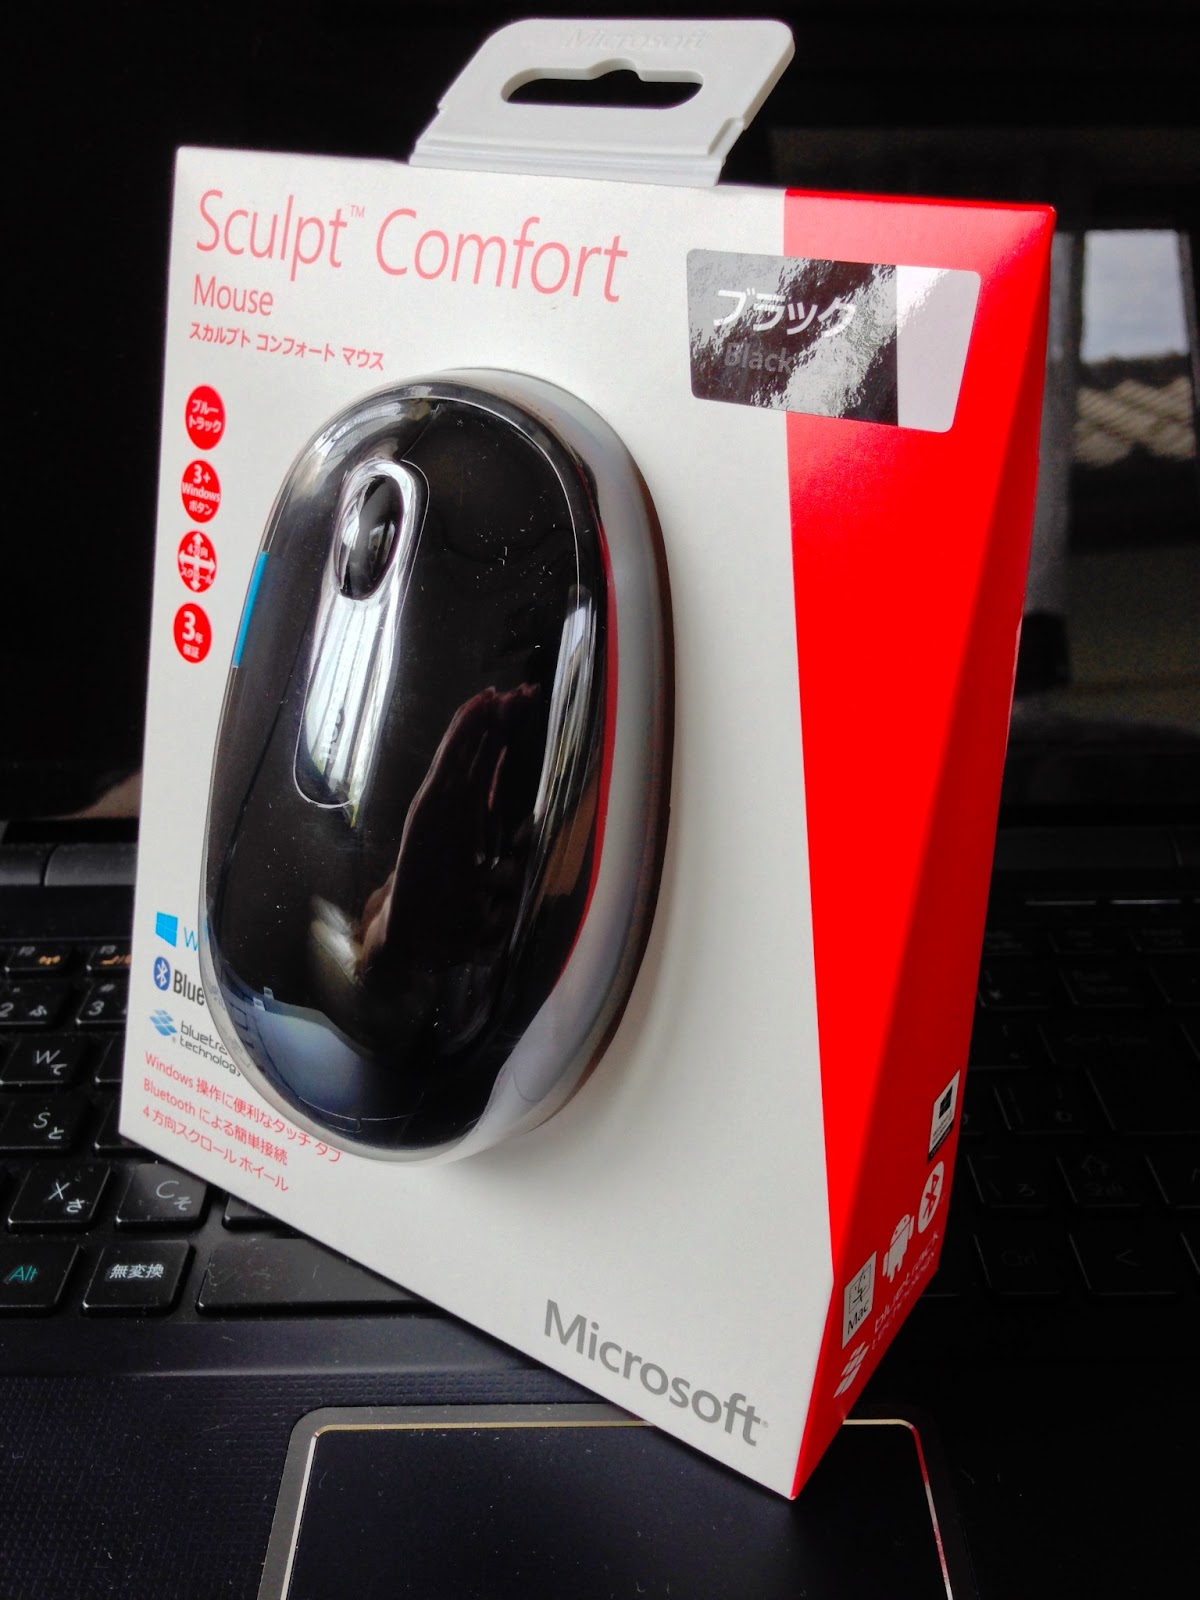 Nine Hundred Microsoft Sculpt Comfort Mouse